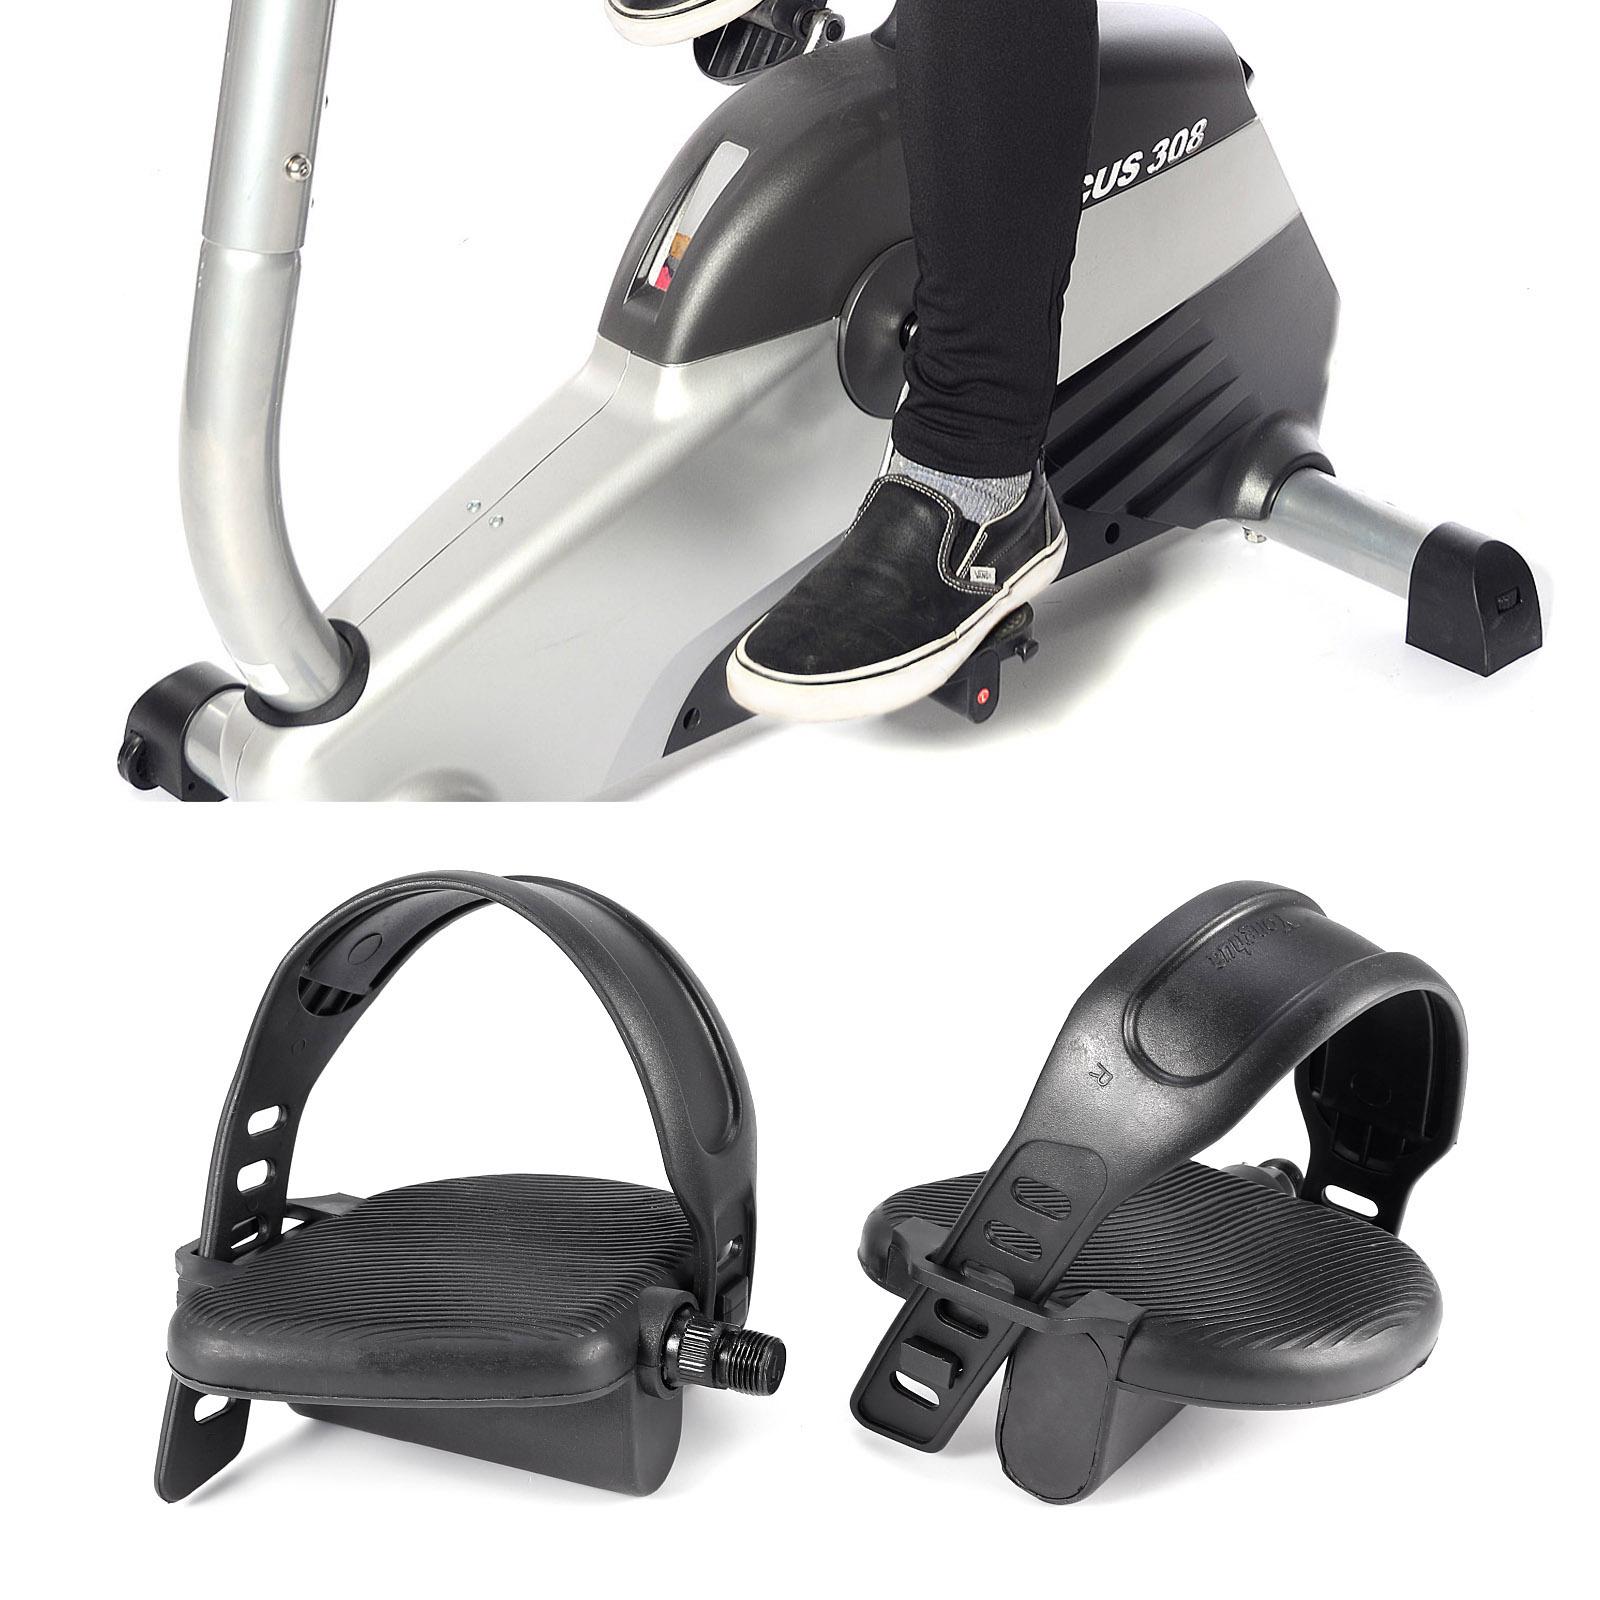 1 2 pedale heimtrainer 9 16 trimmrad ergometer heimtrainerpedale pedale ebay. Black Bedroom Furniture Sets. Home Design Ideas